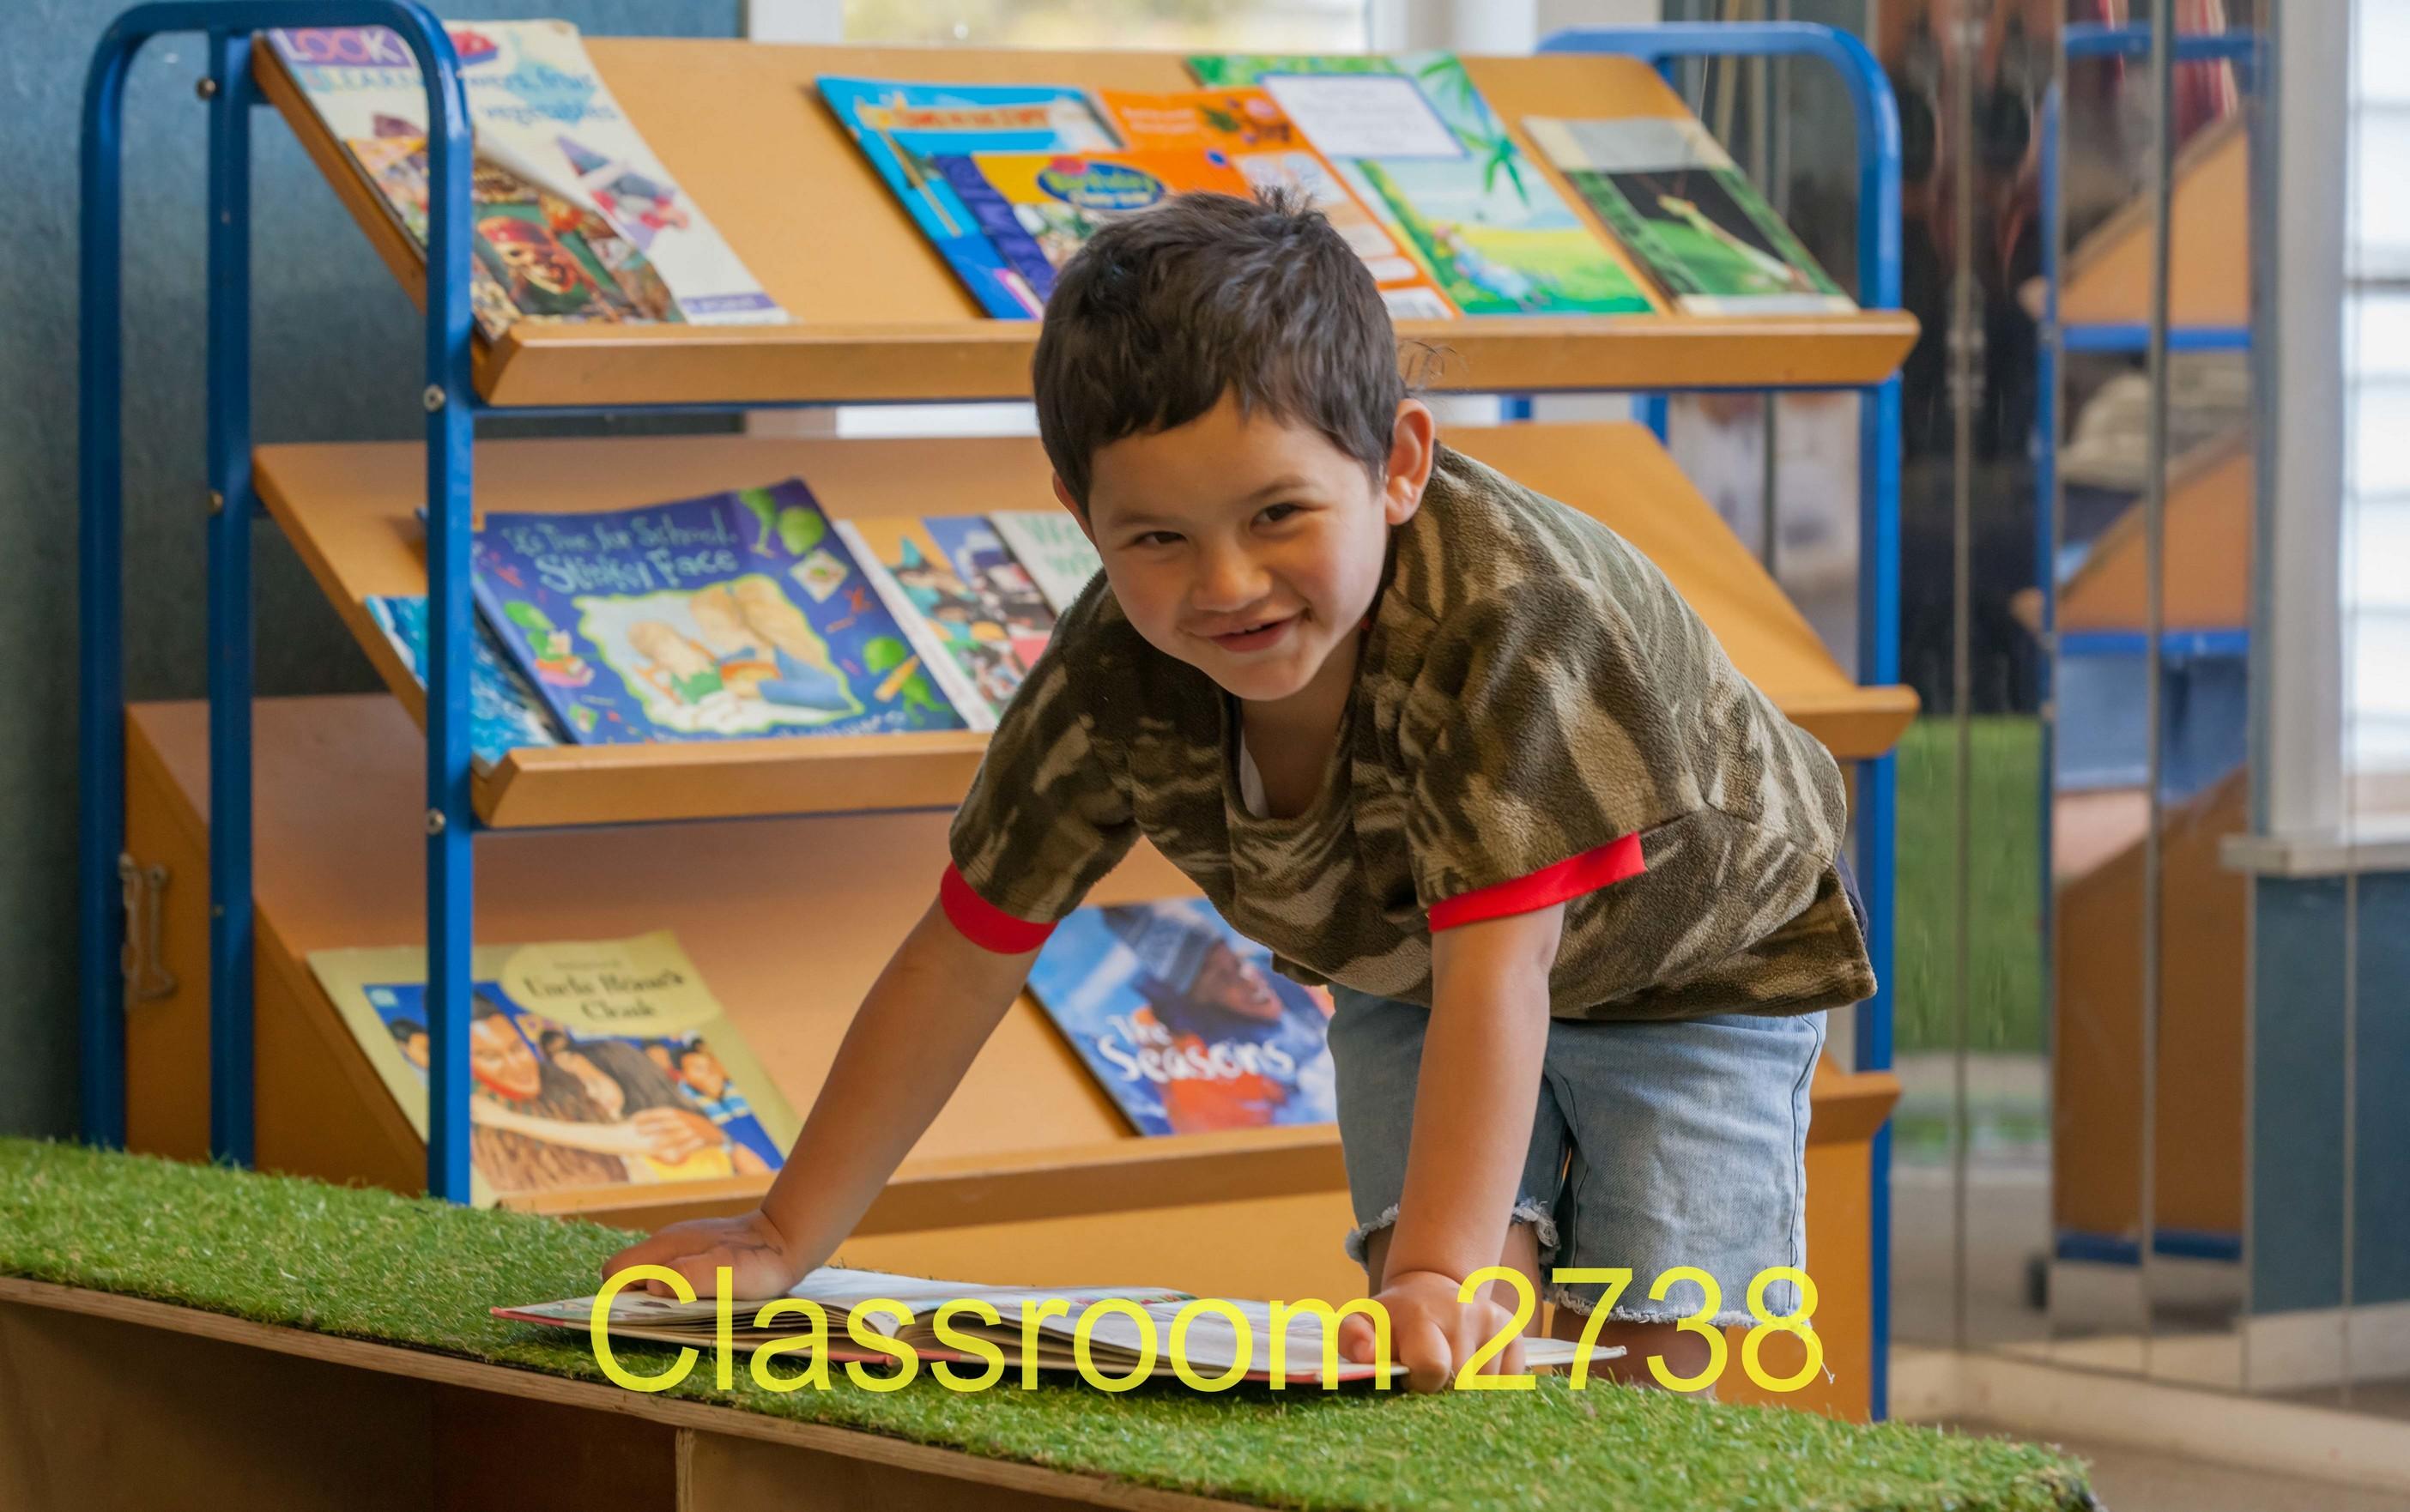 Classroom 2738